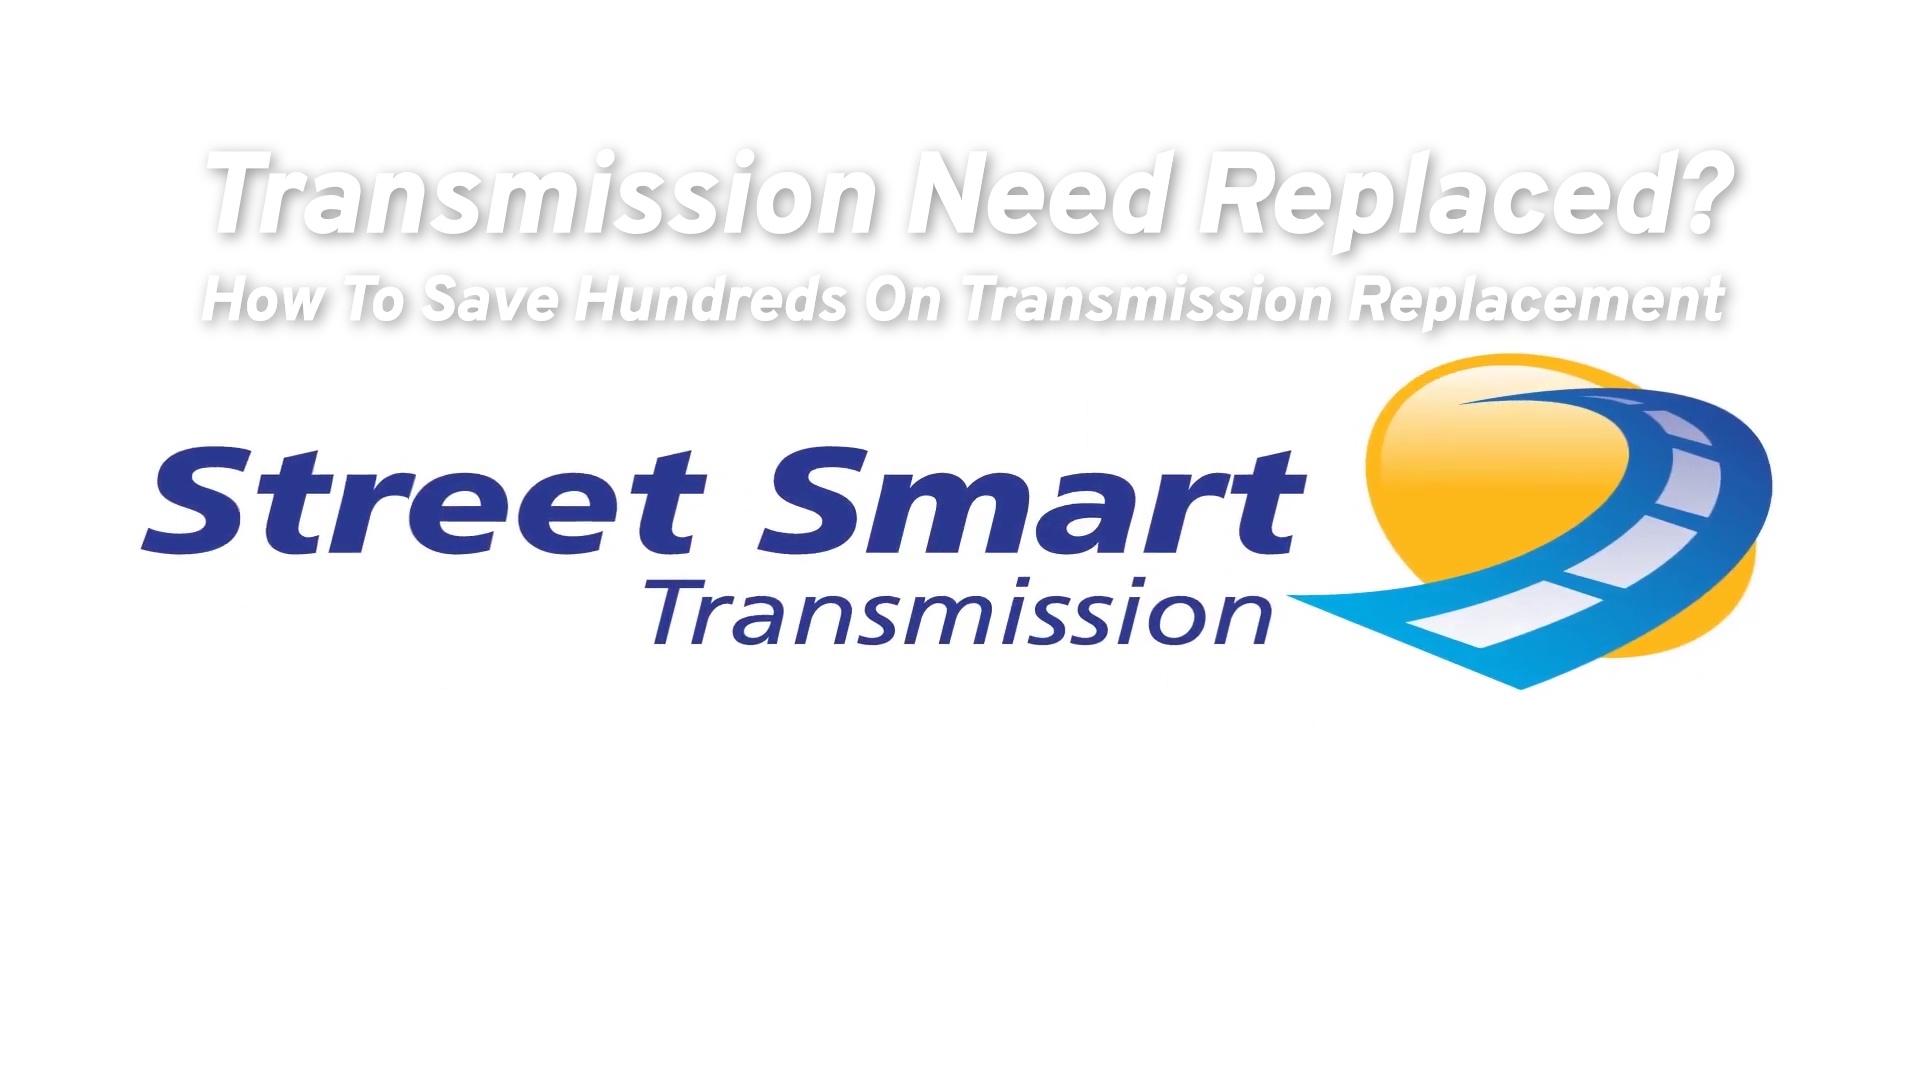 street smart transmission logo [ 1280 x 720 Pixel ]